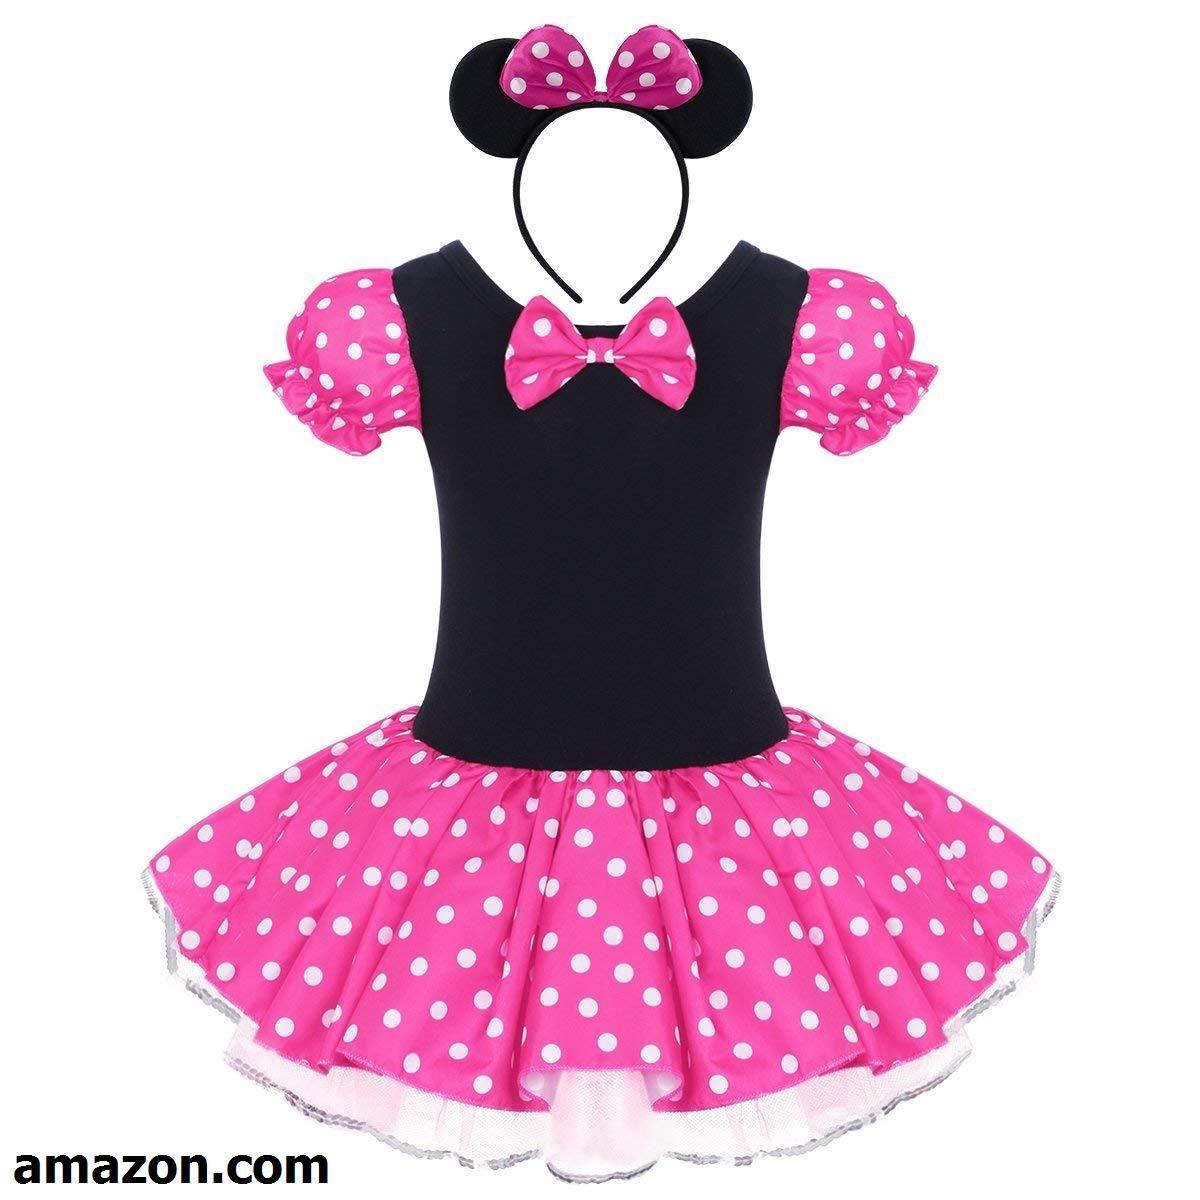 5fb0bb25d IWEMEK Toddlers Girls  Princess Polka Dots Birthday Party Leotard ...